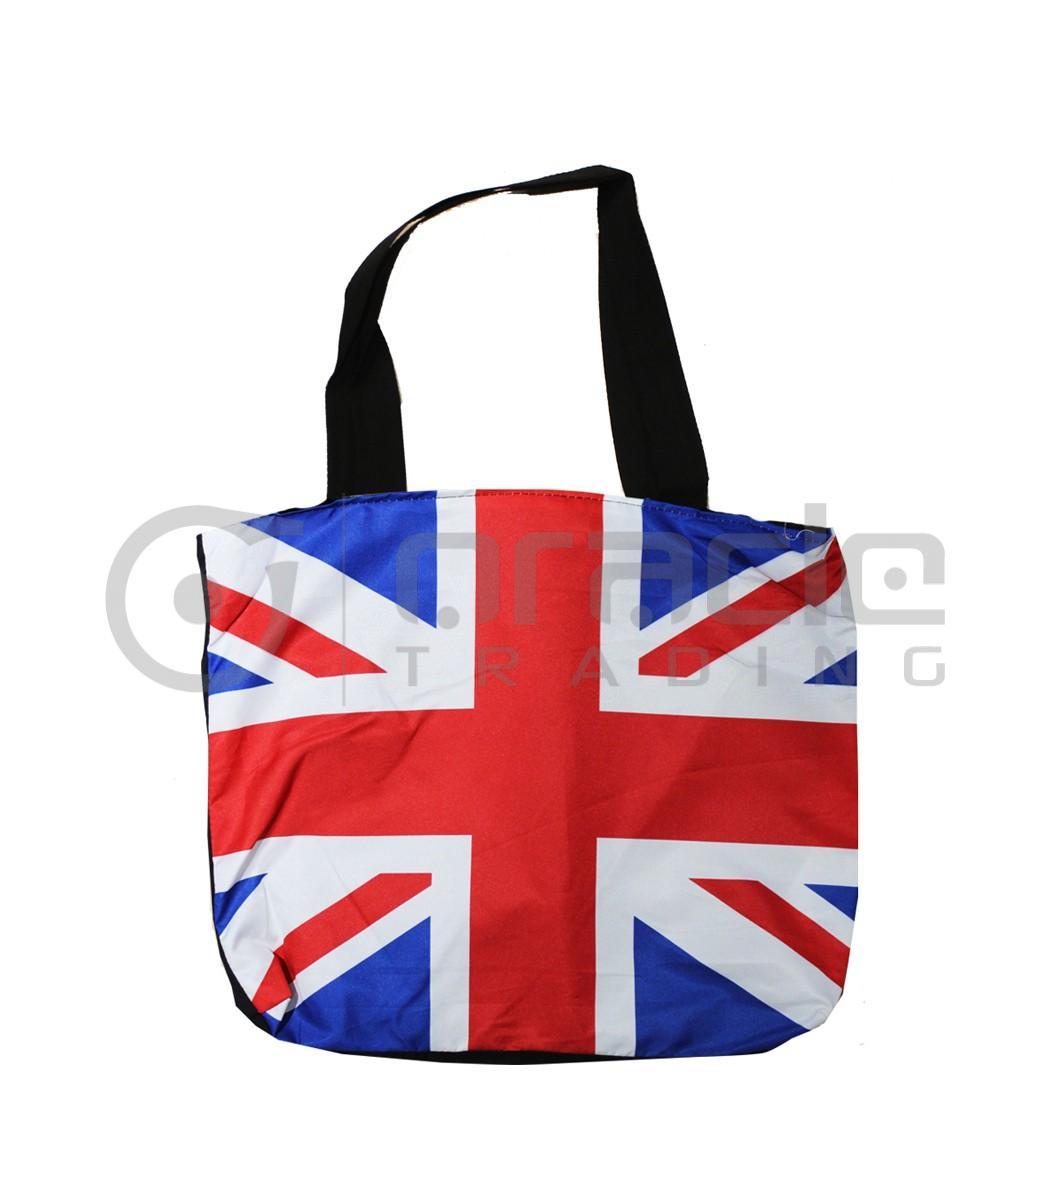 United Kingdom Tote Bag (UK)